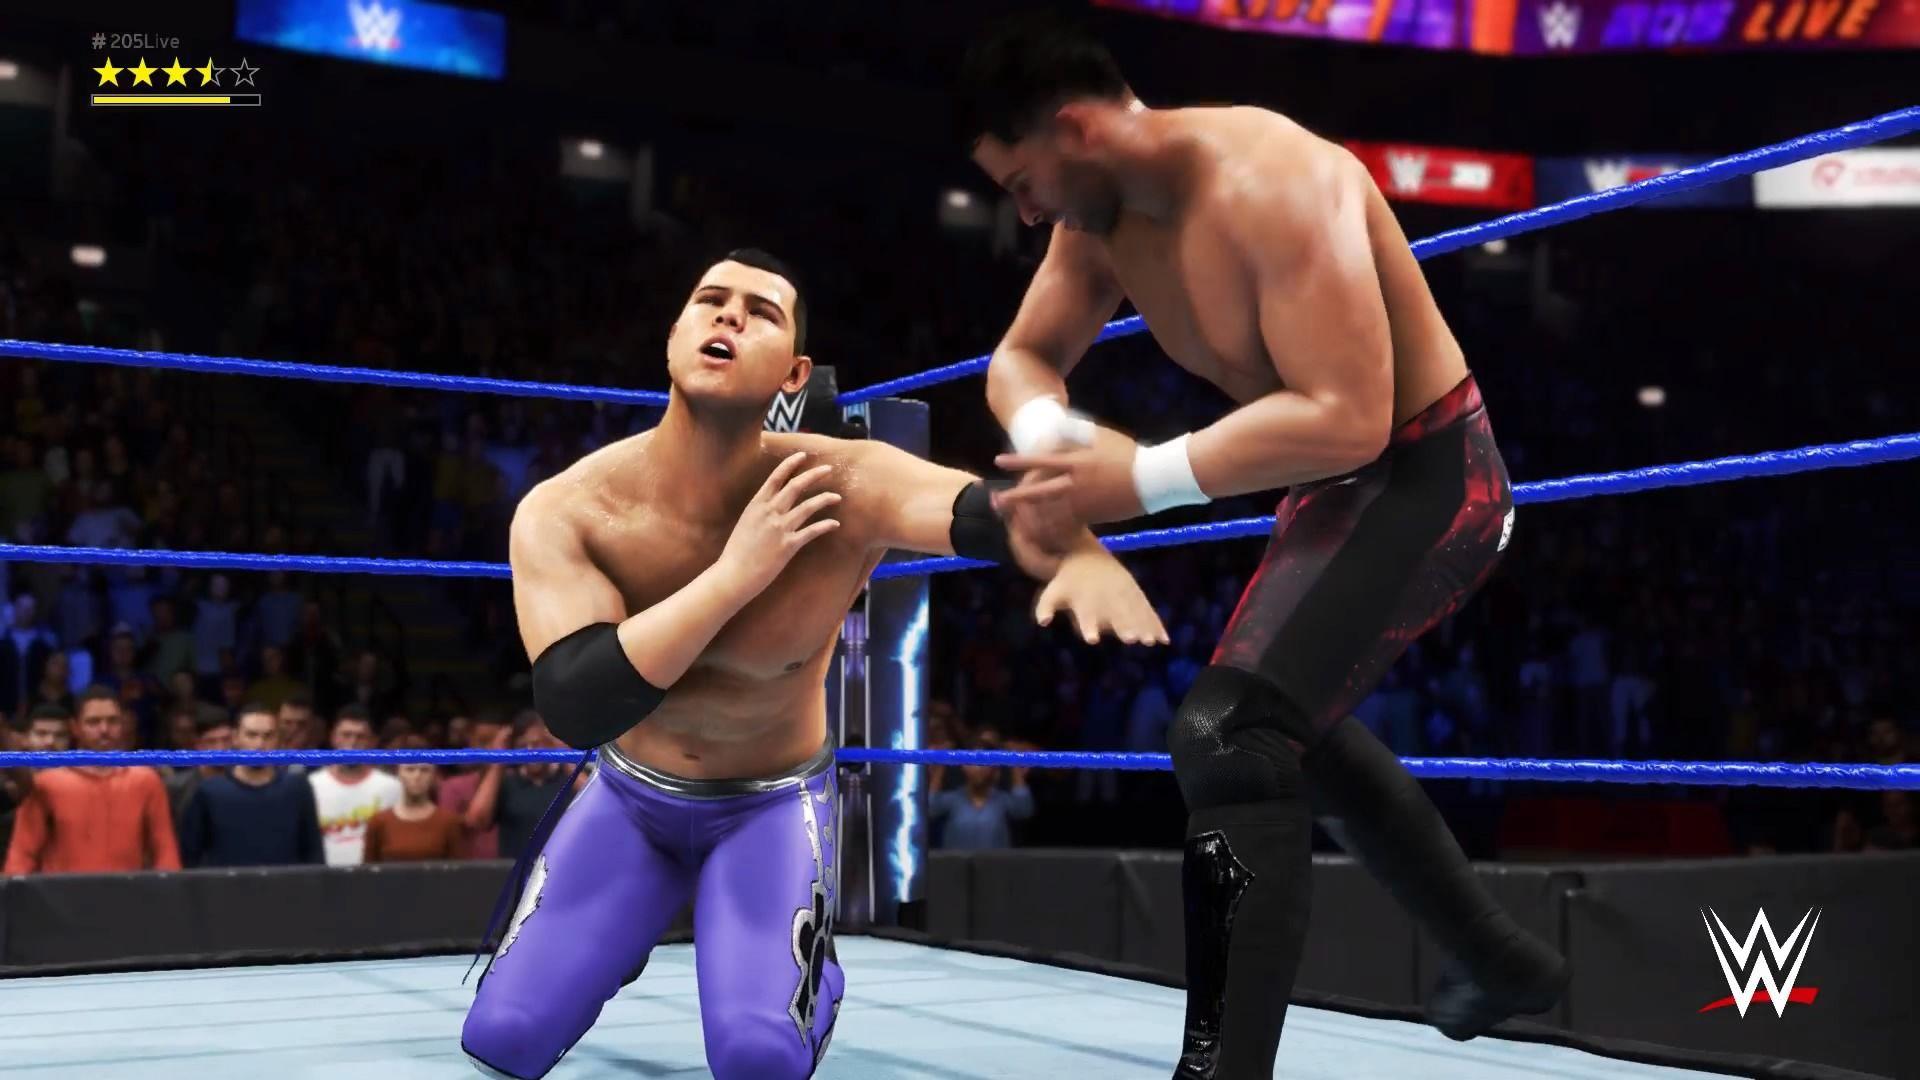 WWE 2K20 Superstar Noam Dar vs Humberto Carrillo Fight in